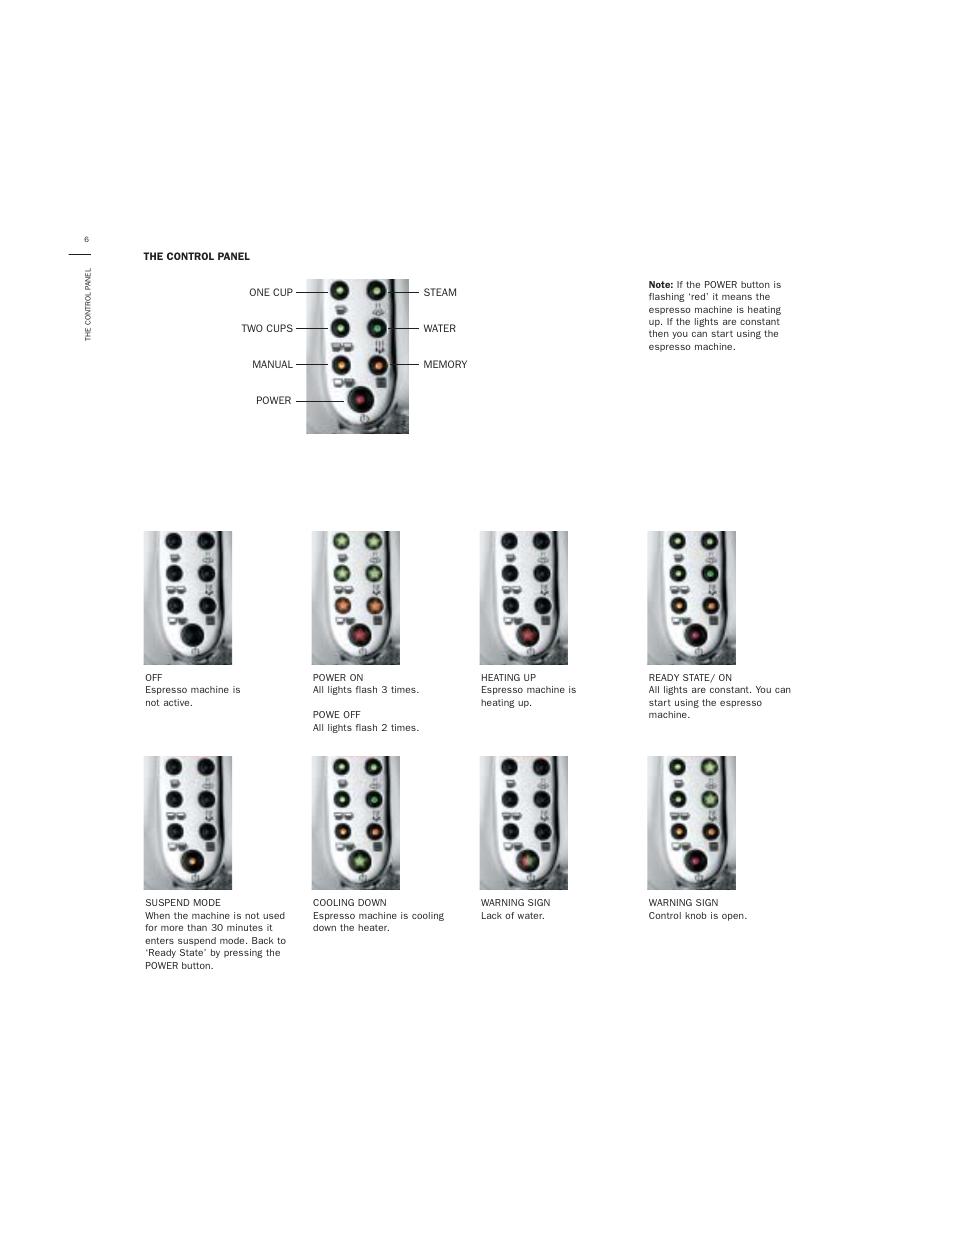 bodum granos 3020 user manual page 8 26 rh manualsdir com Deere 3020 Optiplex 3020